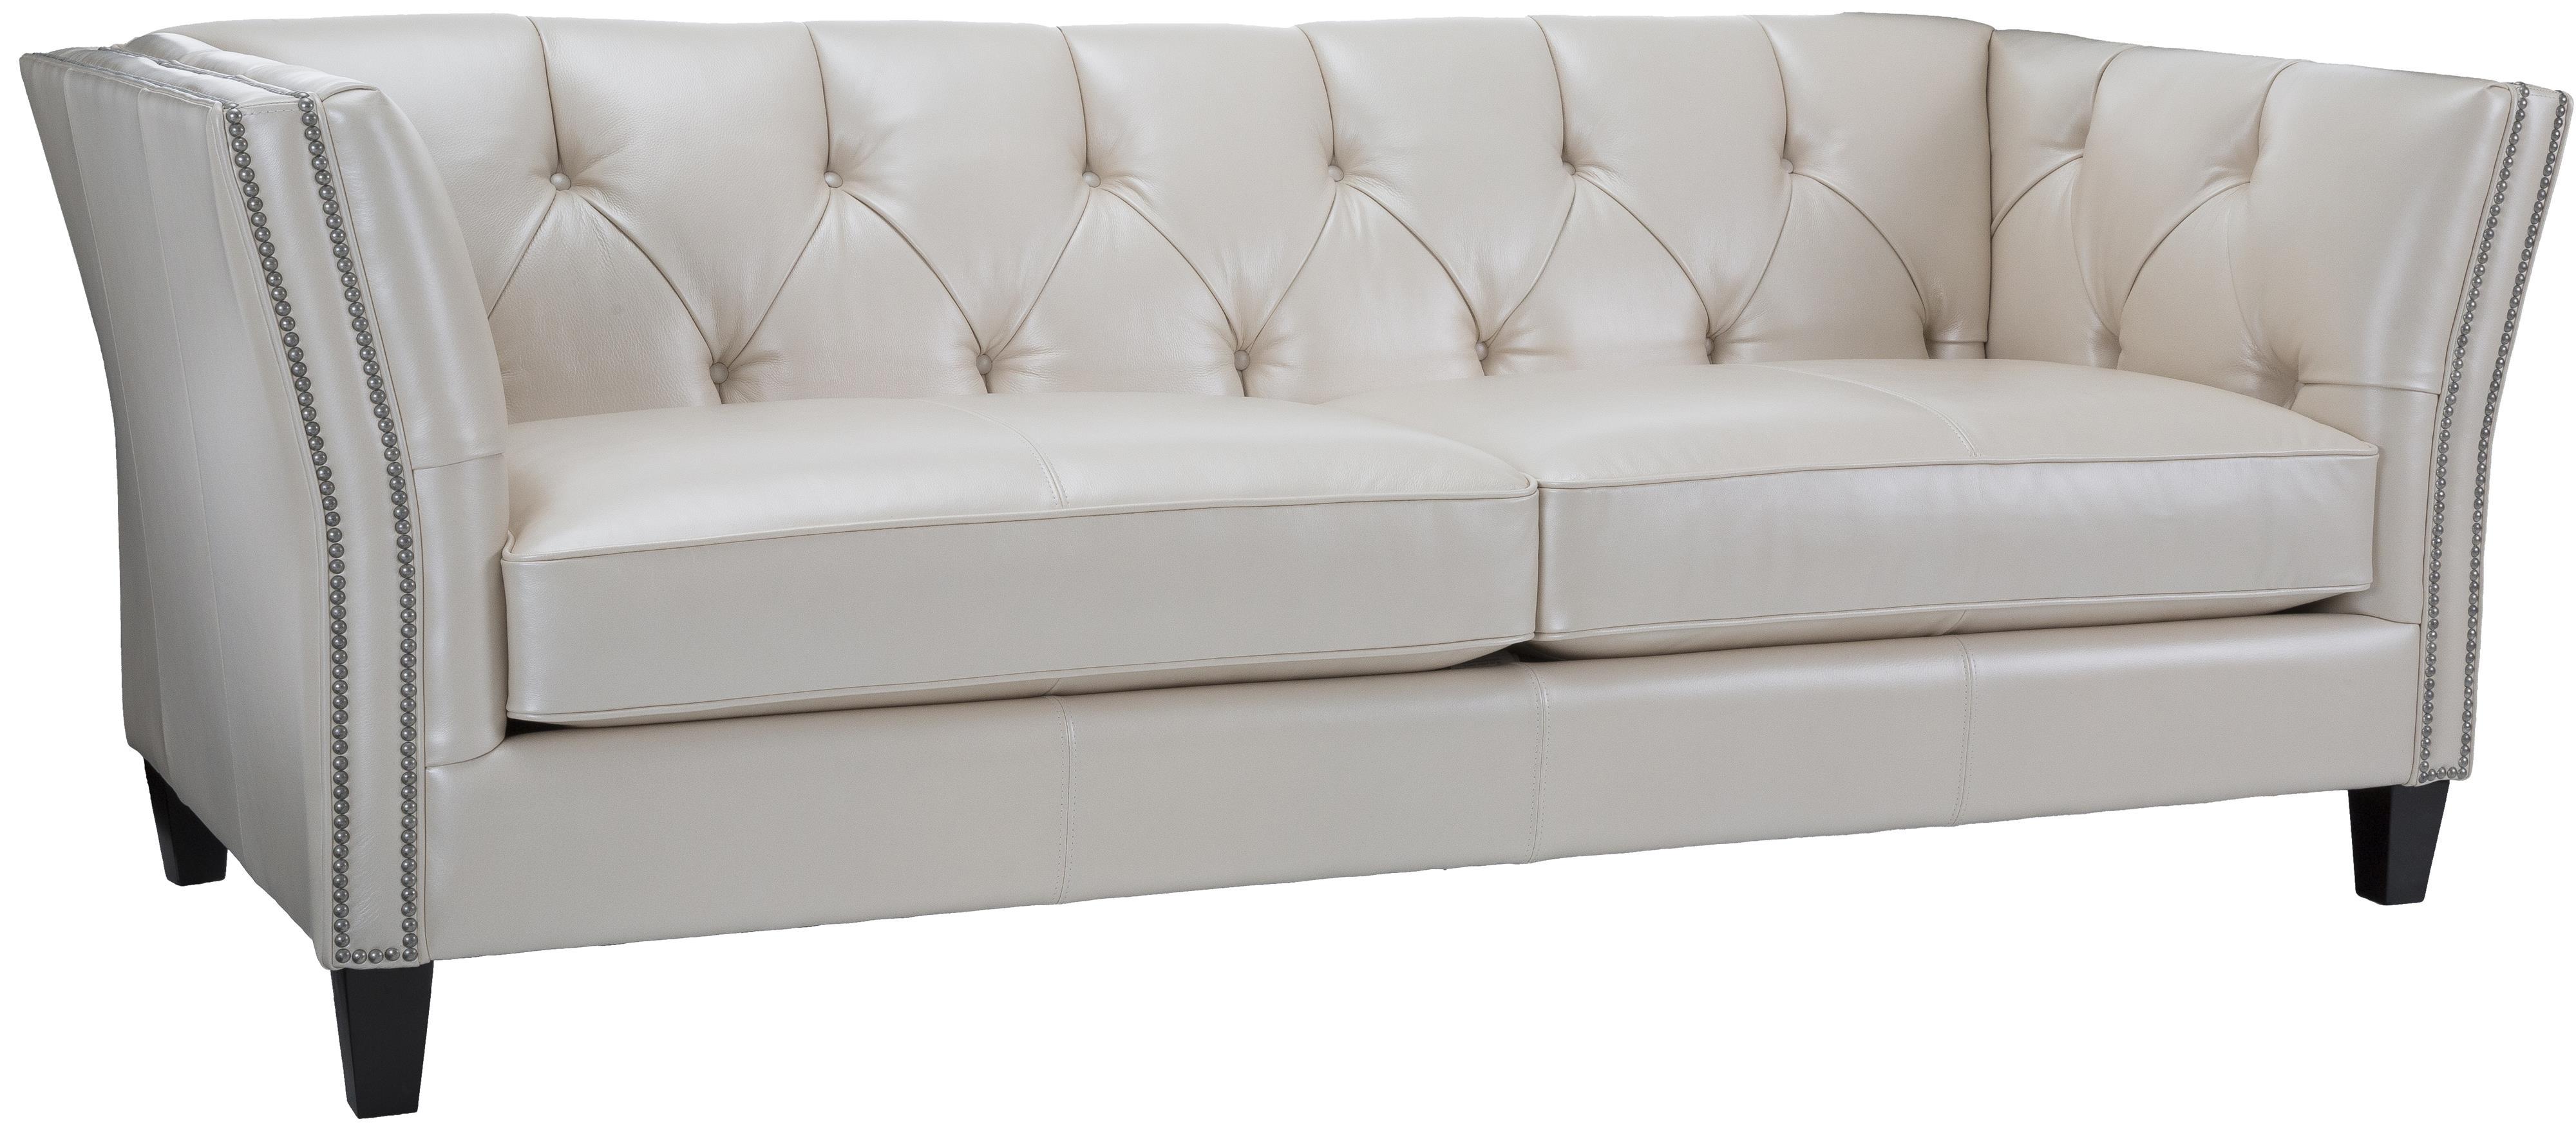 Decor-Rest 3555 Transitional Sofa - Item Number: 3555-Sofa-Dream Ice II WHT